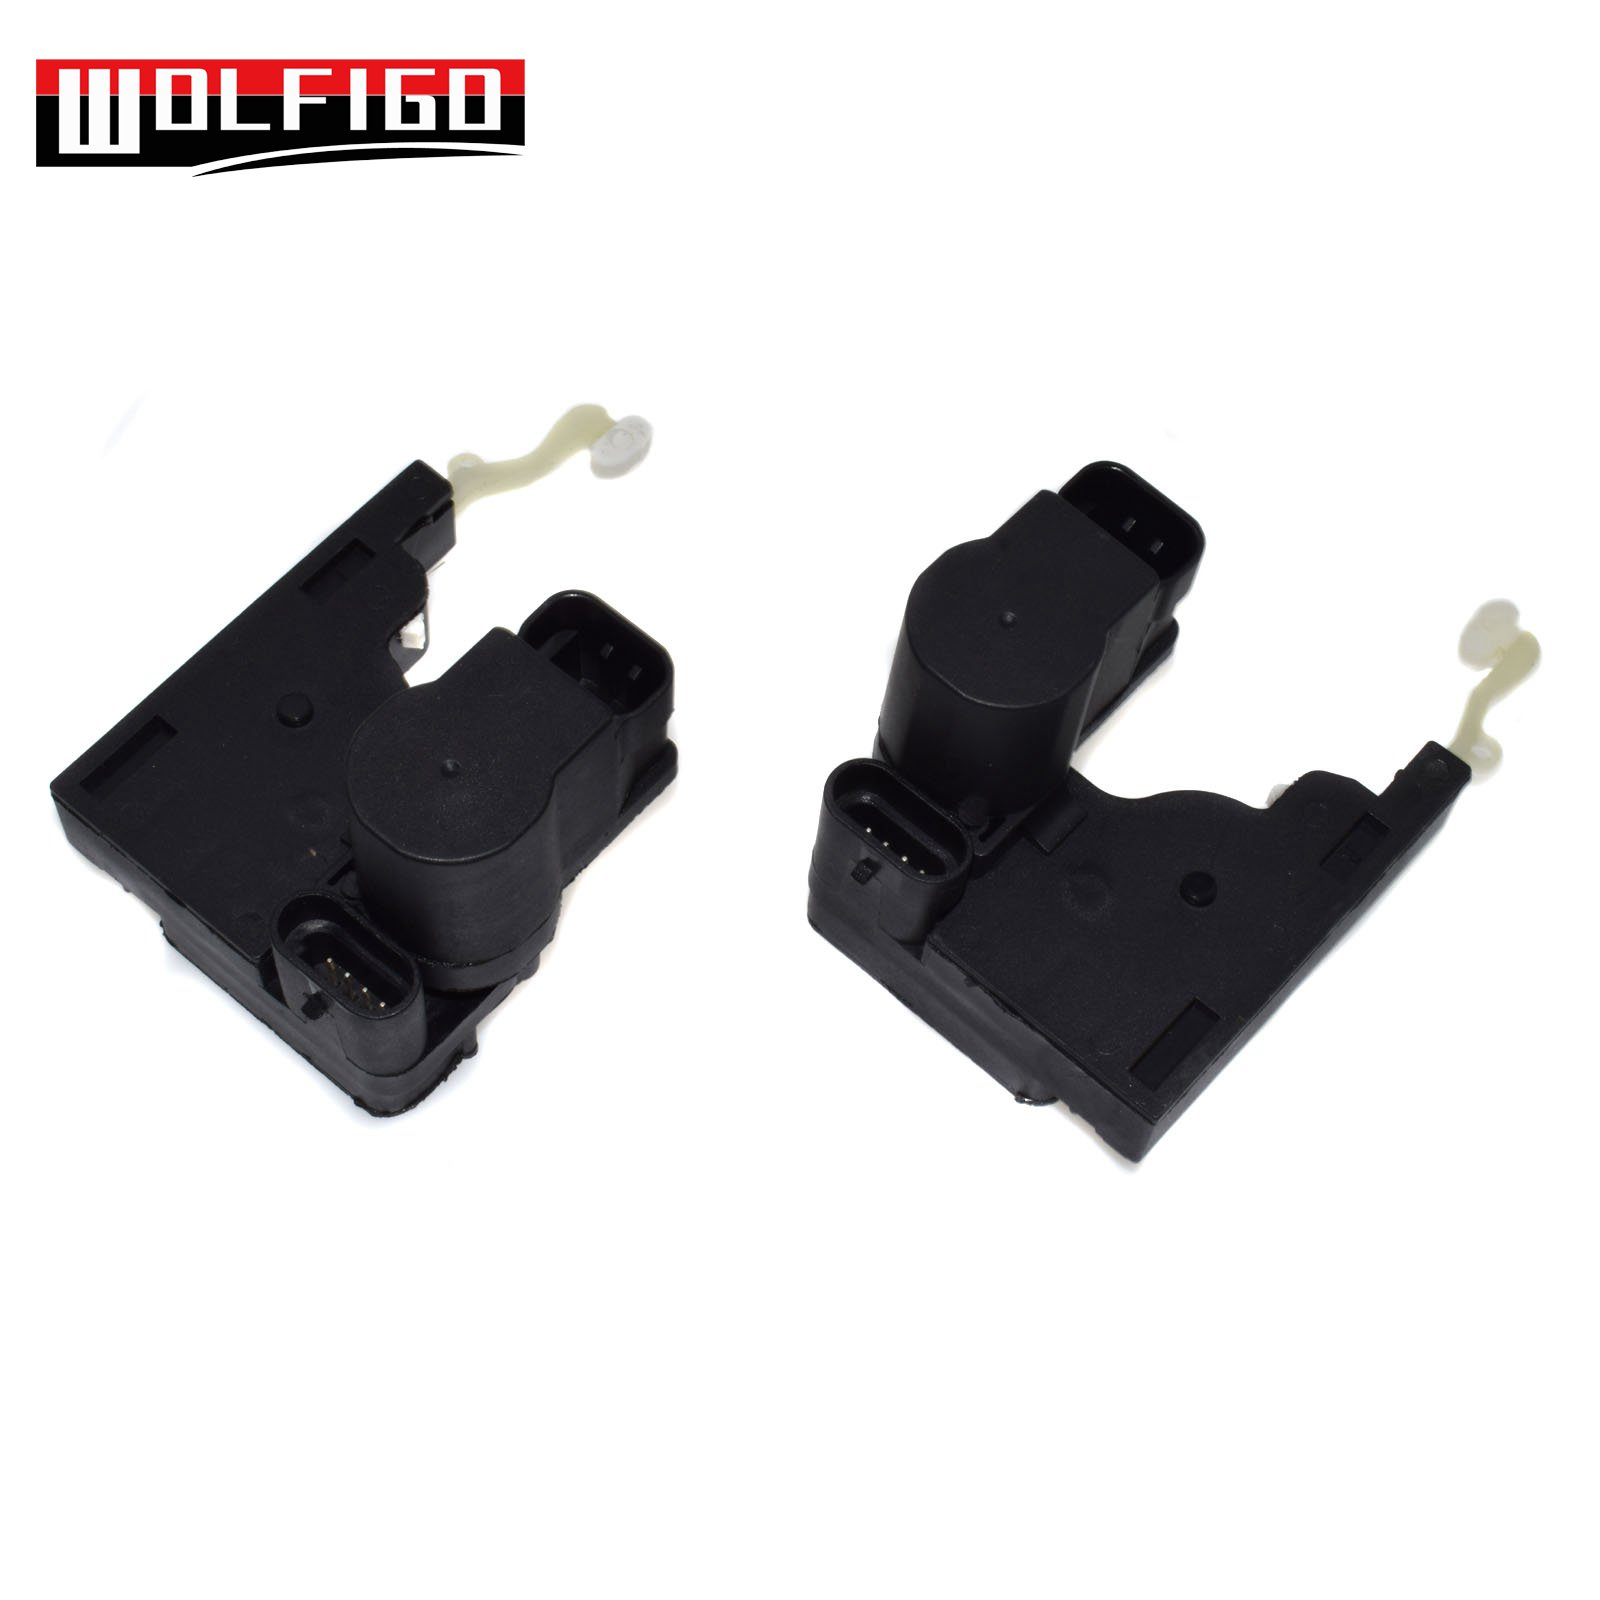 2 Pcs Left+Right Door Lock Actuator for Chevrolet Cadillac Buick 25664288 25664287